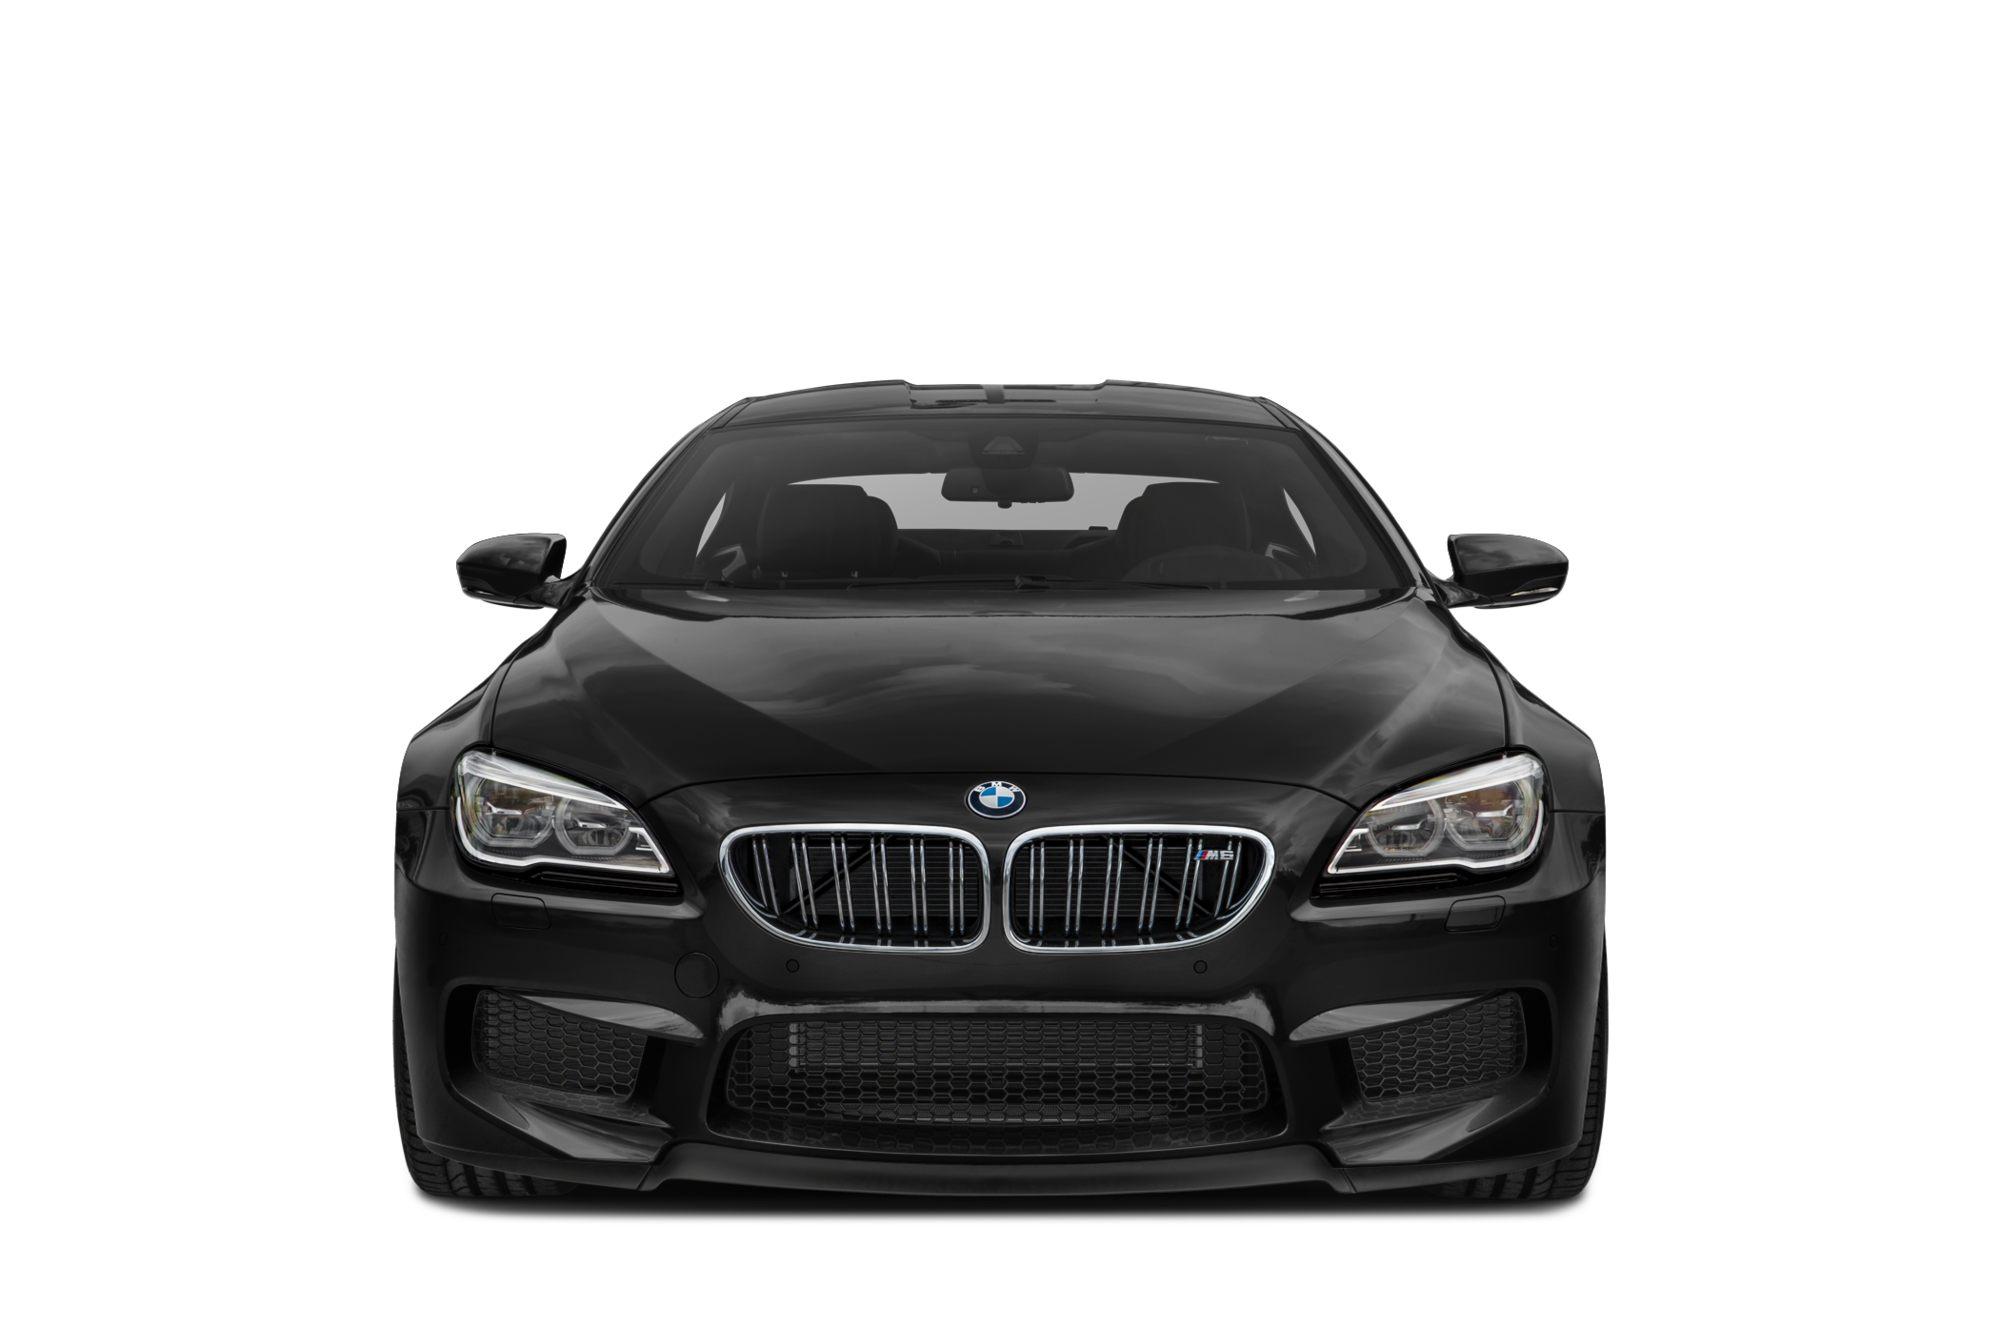 2014-2019 BMW M6 Gran Coupe: Recall Alert